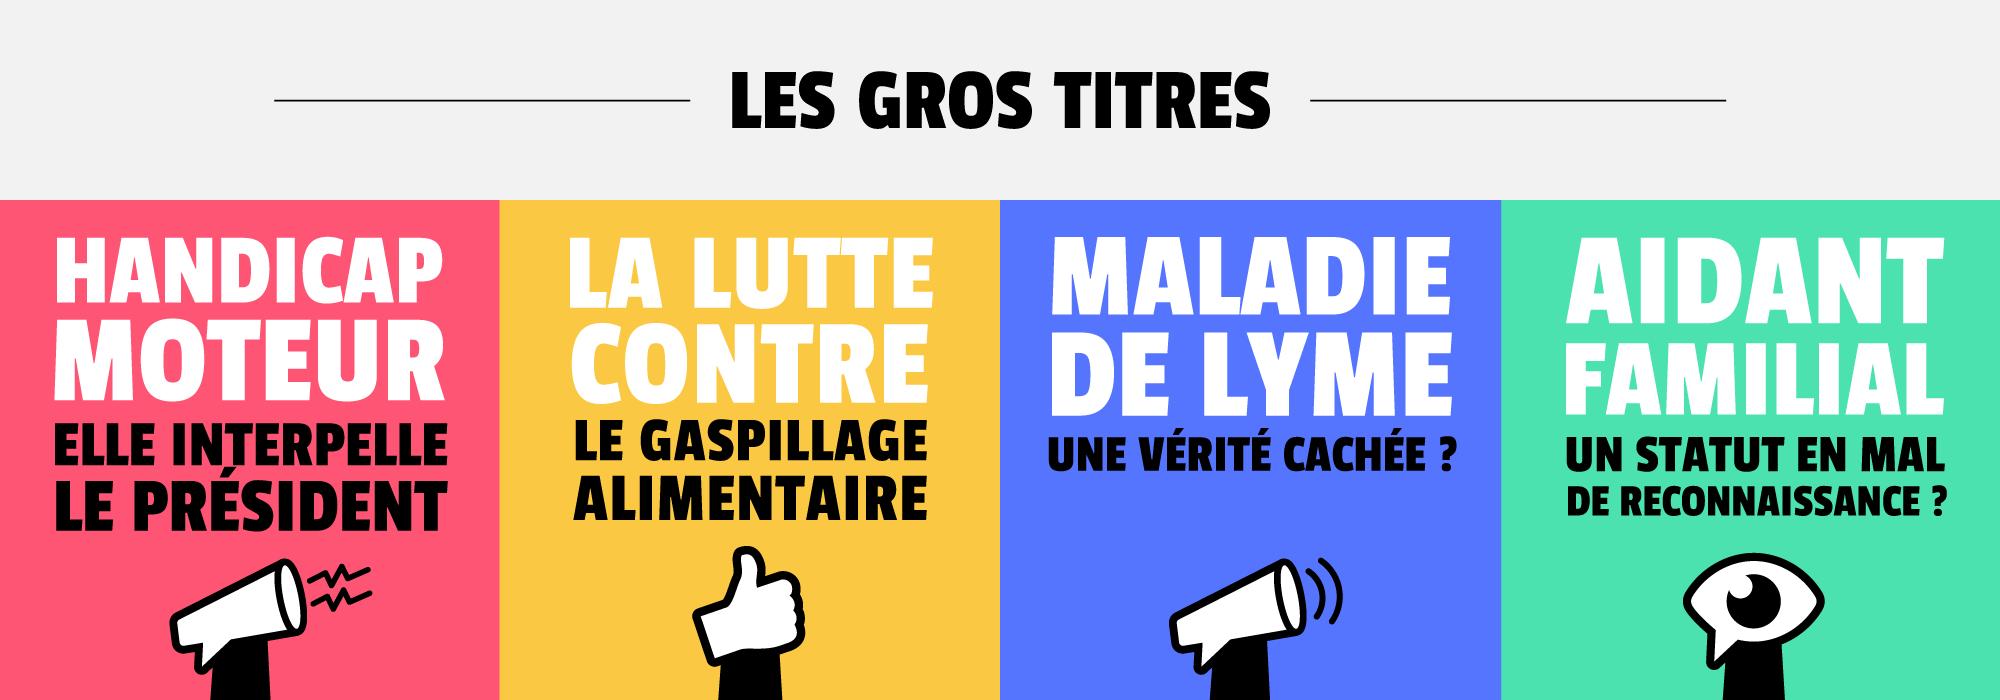 L'AVIS DES GENS – GROS TITRES